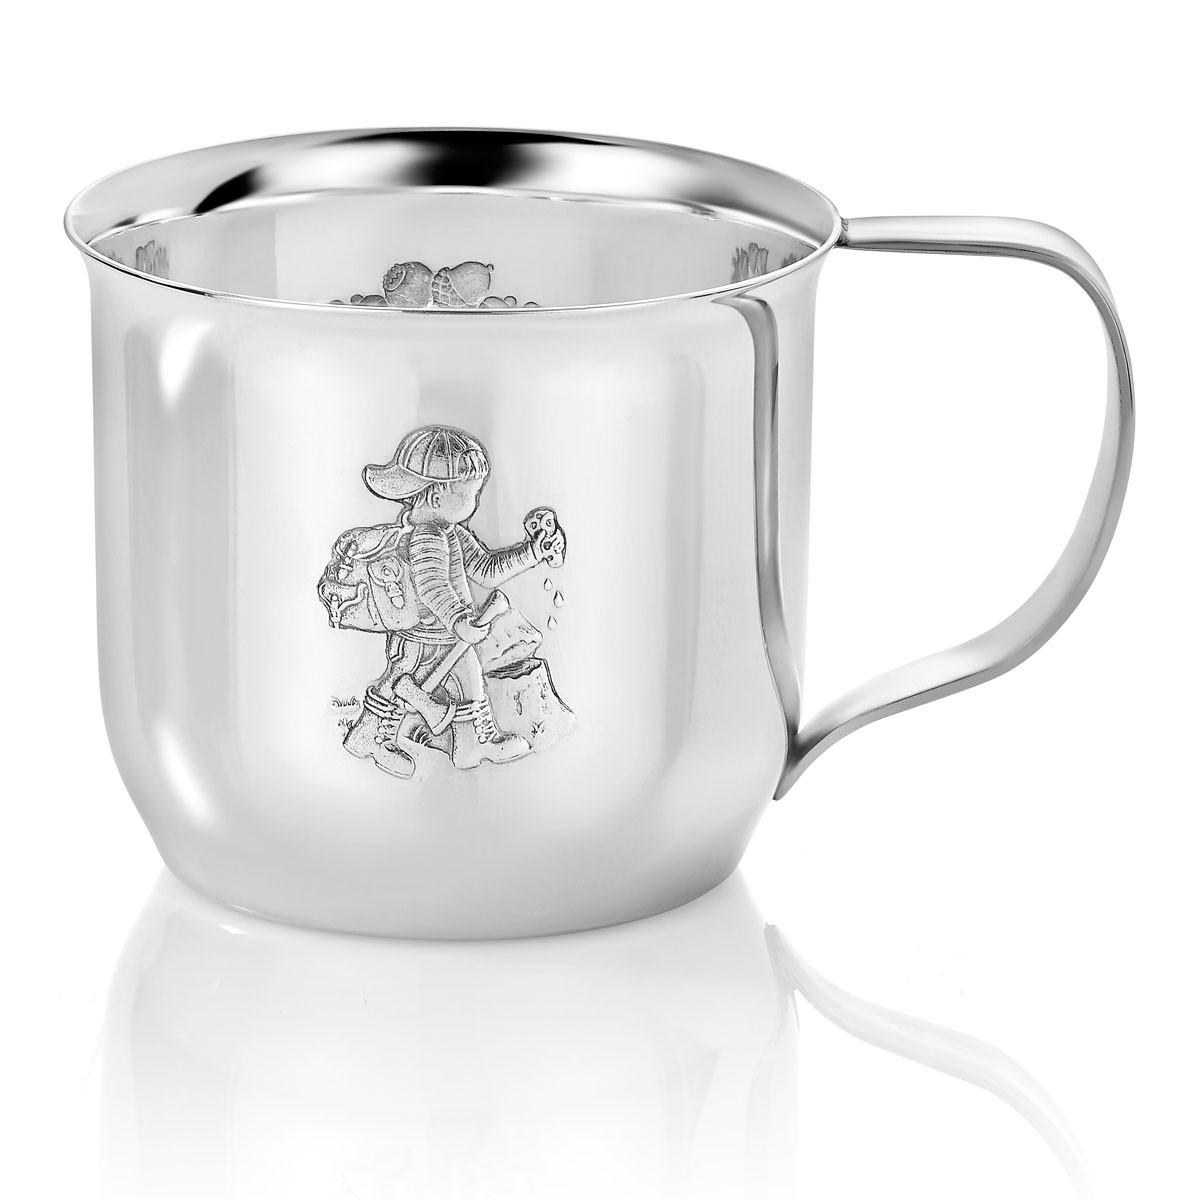 Espen Askeladd som kappåt - sølvkrus